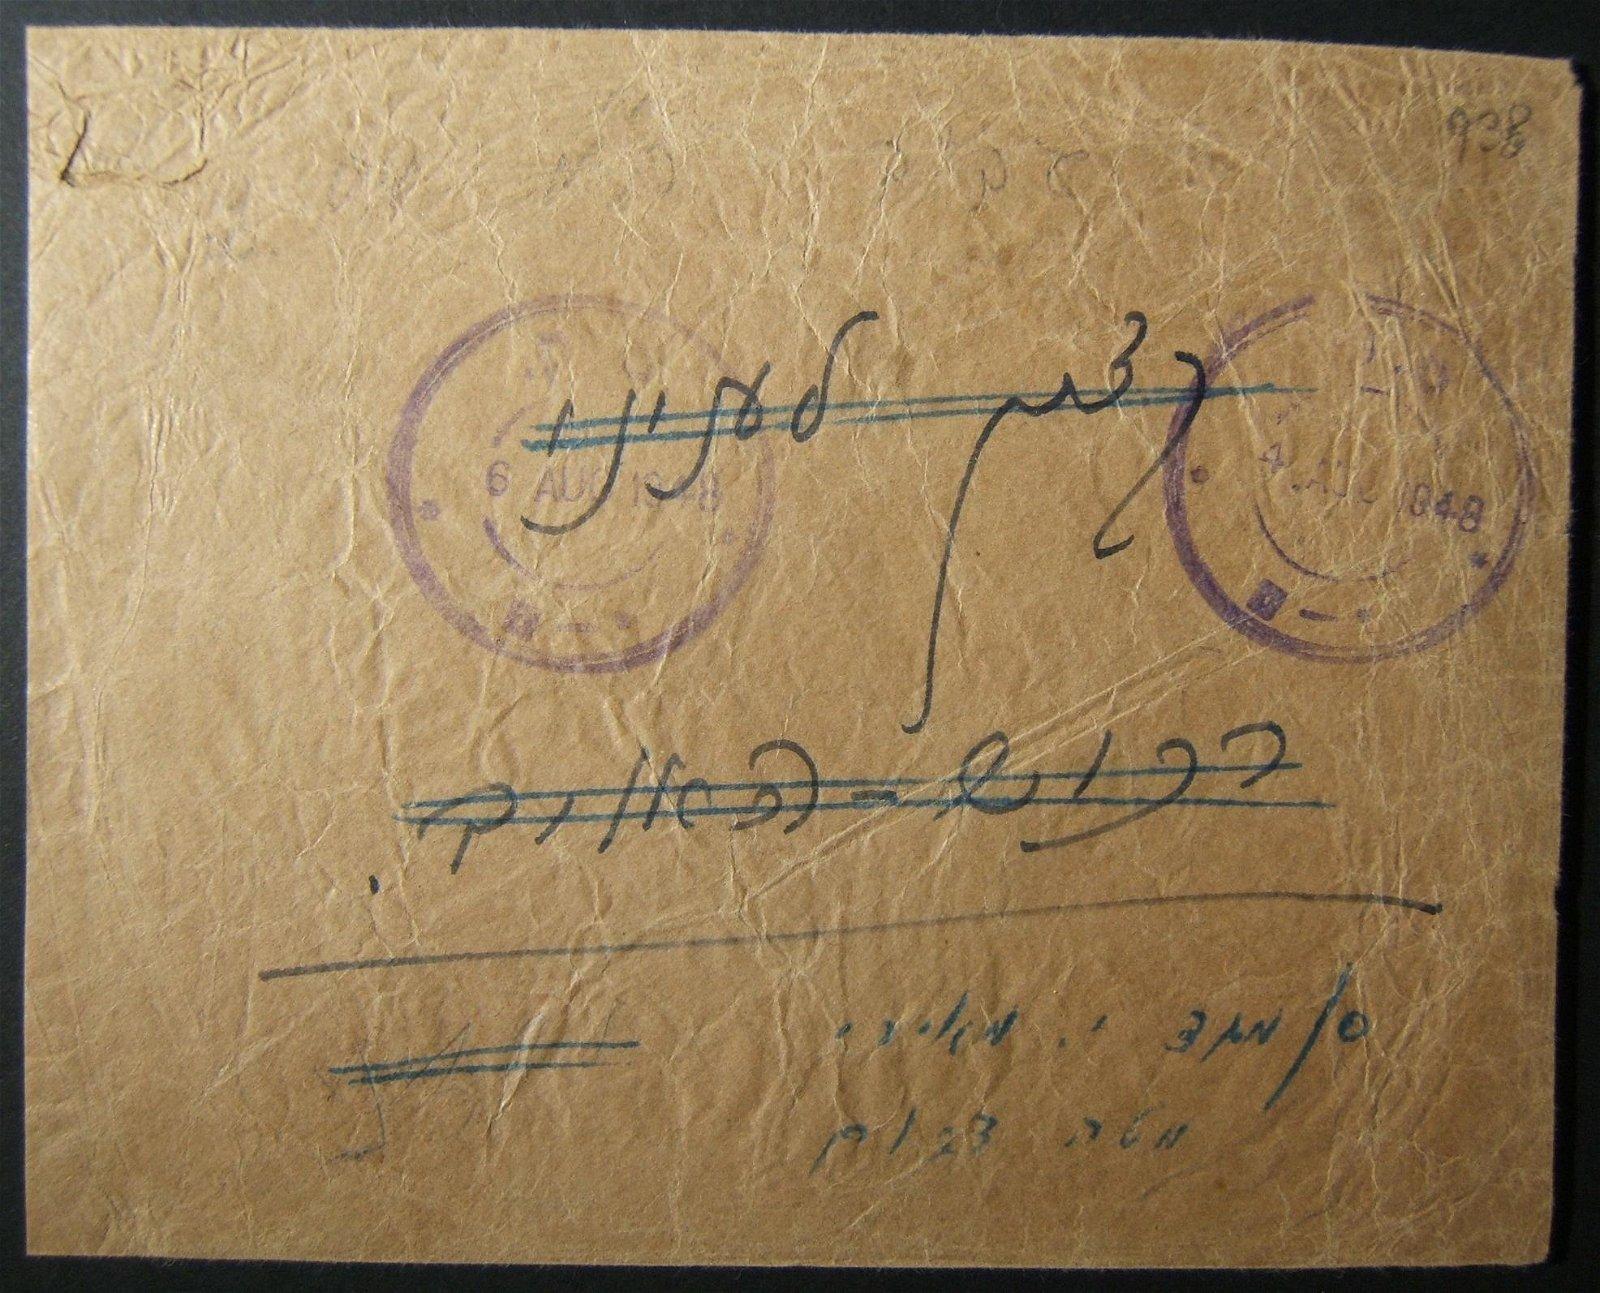 4 Aug 1948 Misrad Kesher Jerusalem Signals Corp